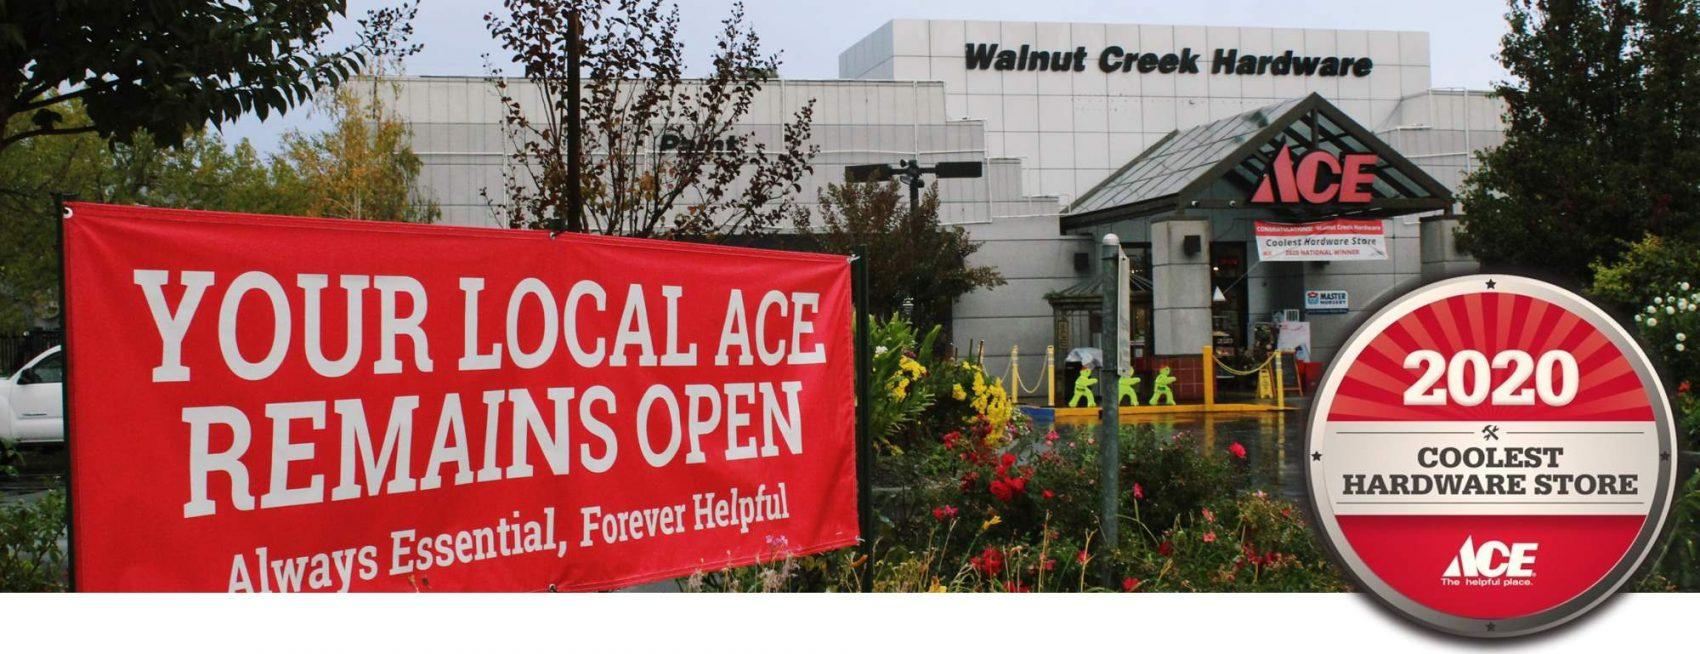 New Home Christmas Header Walnut Creek Ace Hardware Christmas Gift Ideas No Snow 11 Mobile